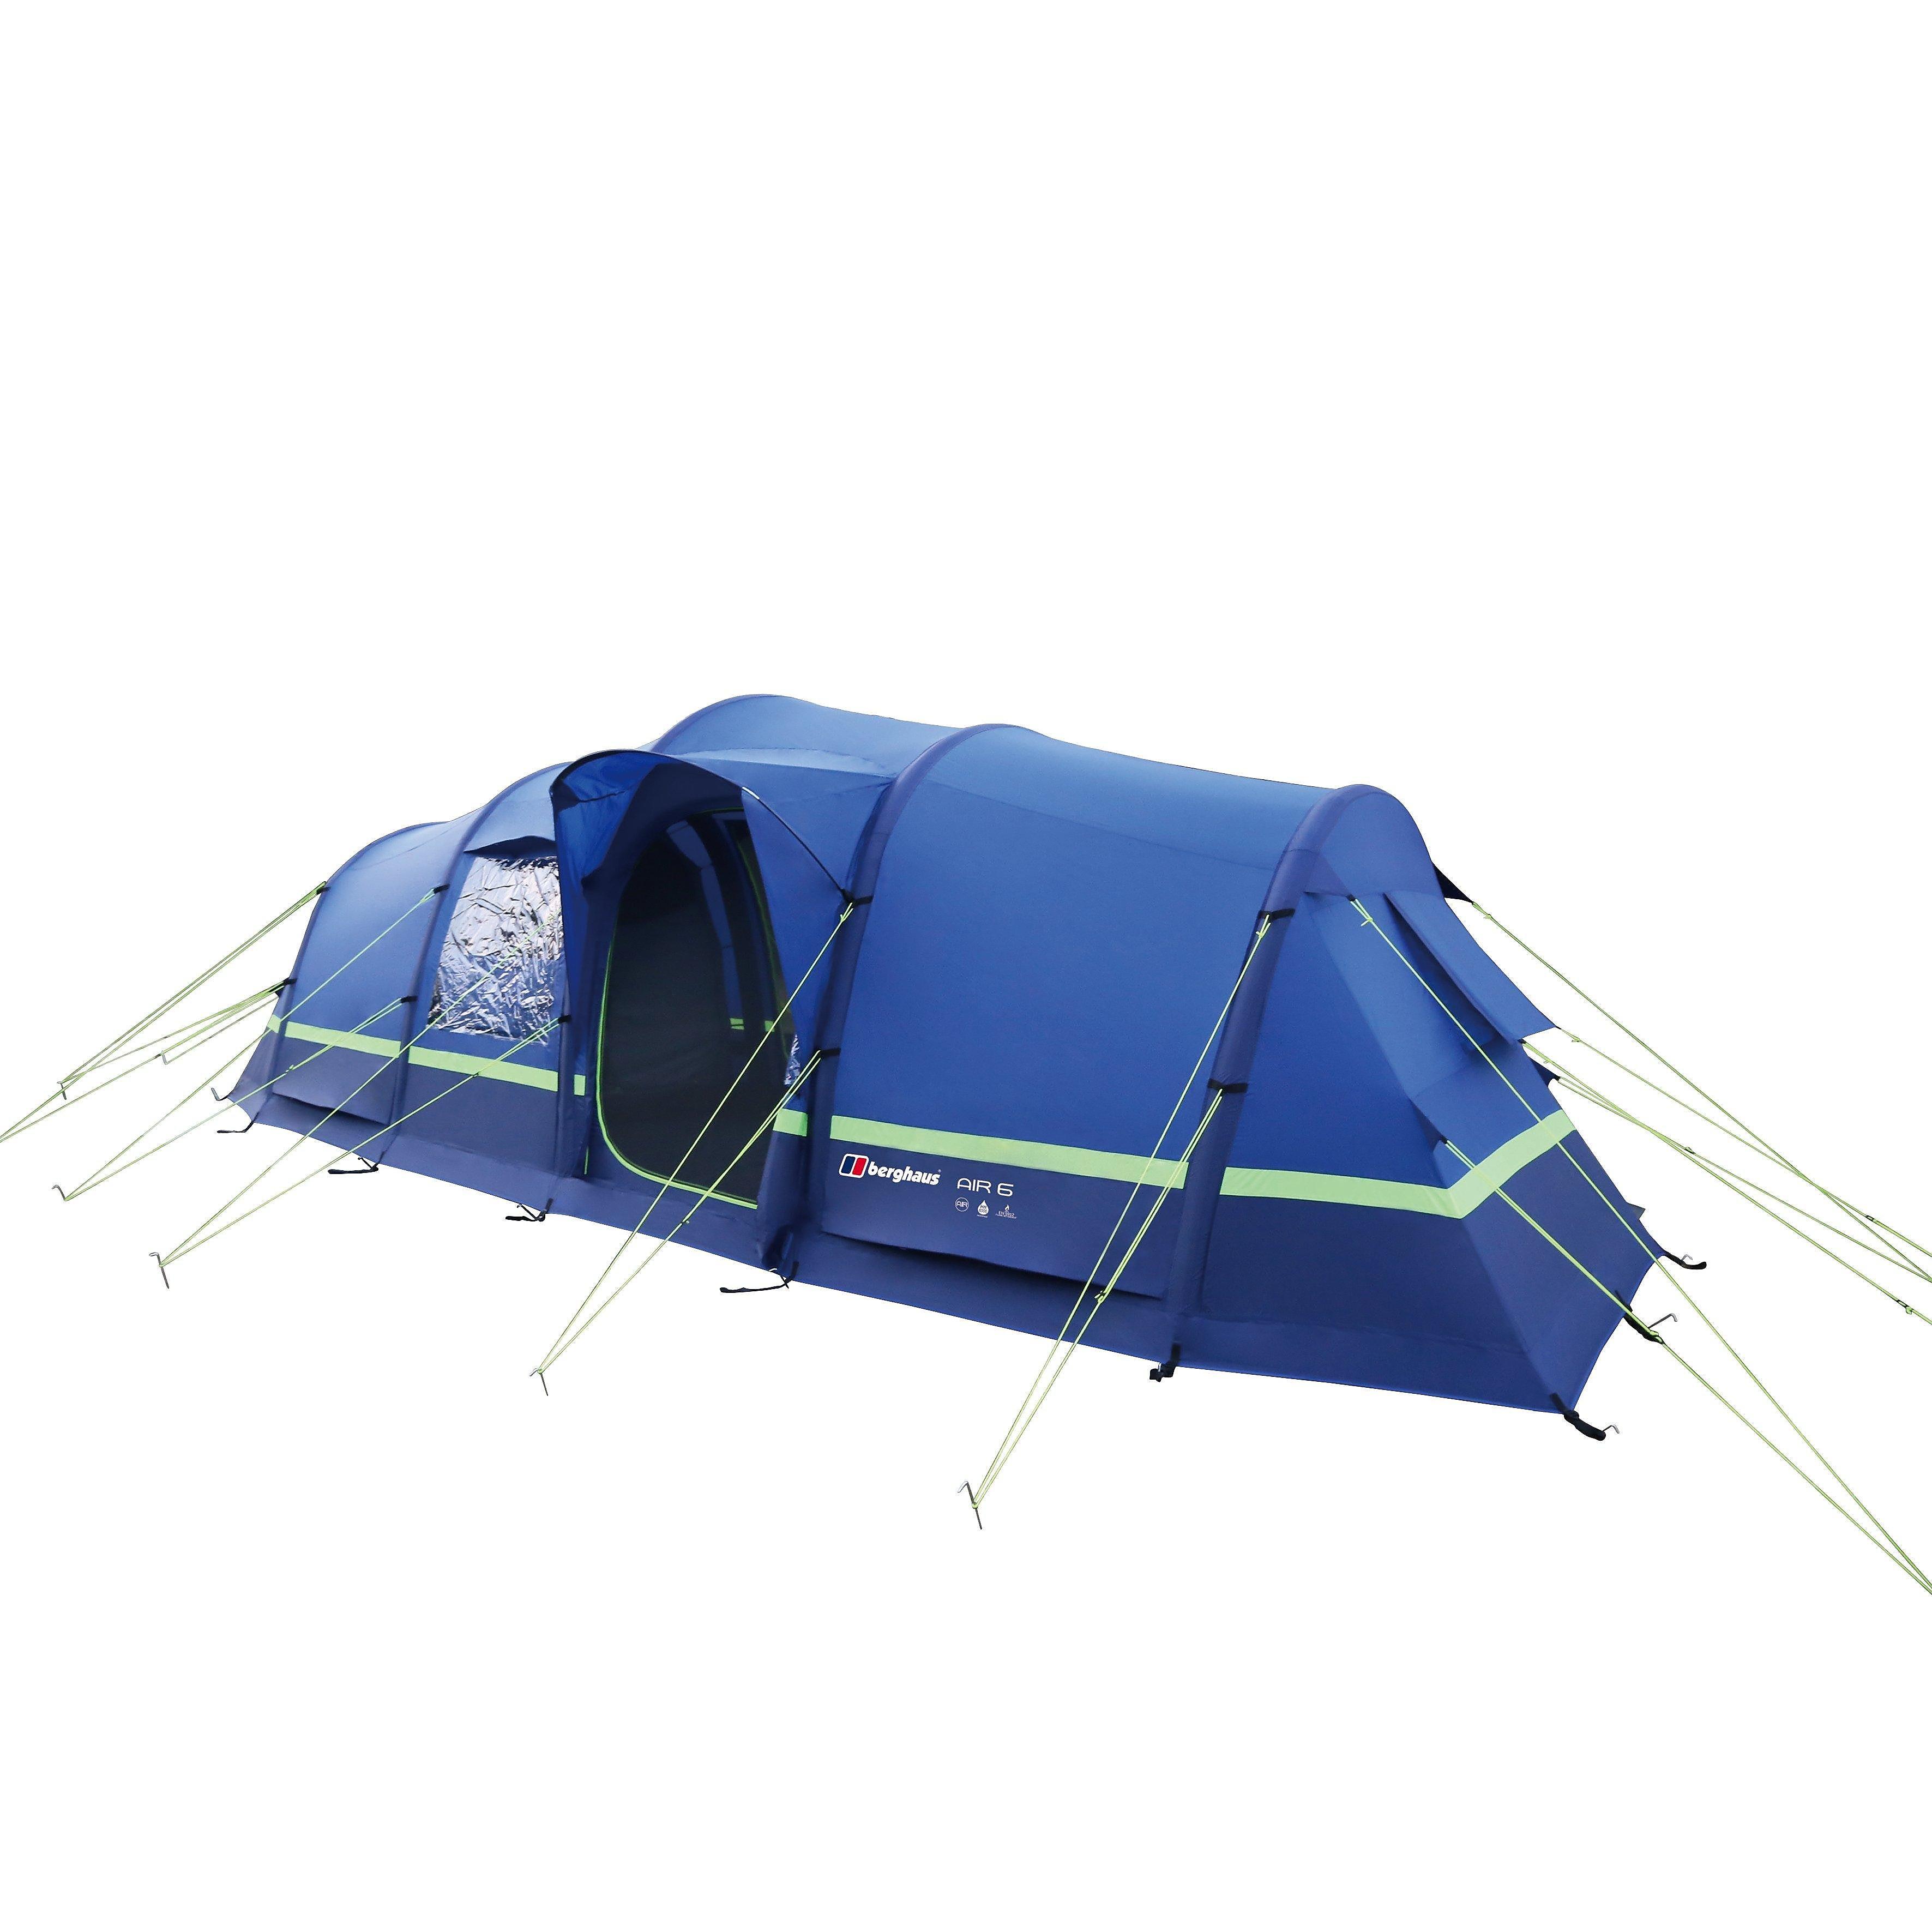 Berghaus Air 6 Tent Footprint